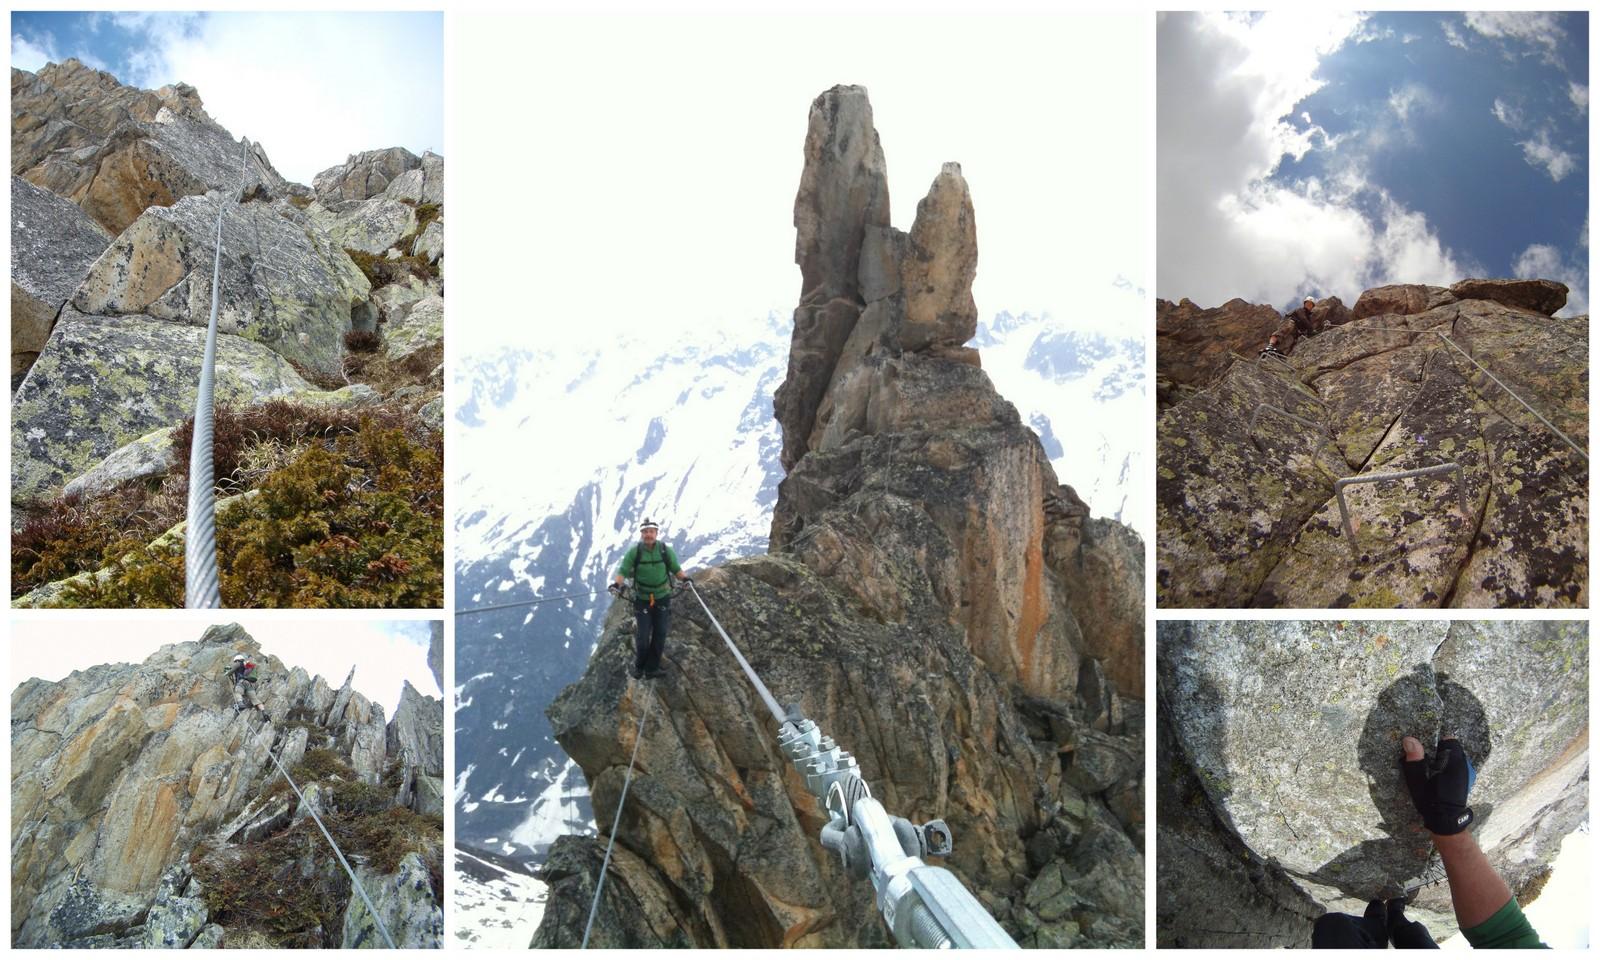 Klettersteig Krokodil : Gc meez klettersteig bergsee krokodil traditional cache in uri